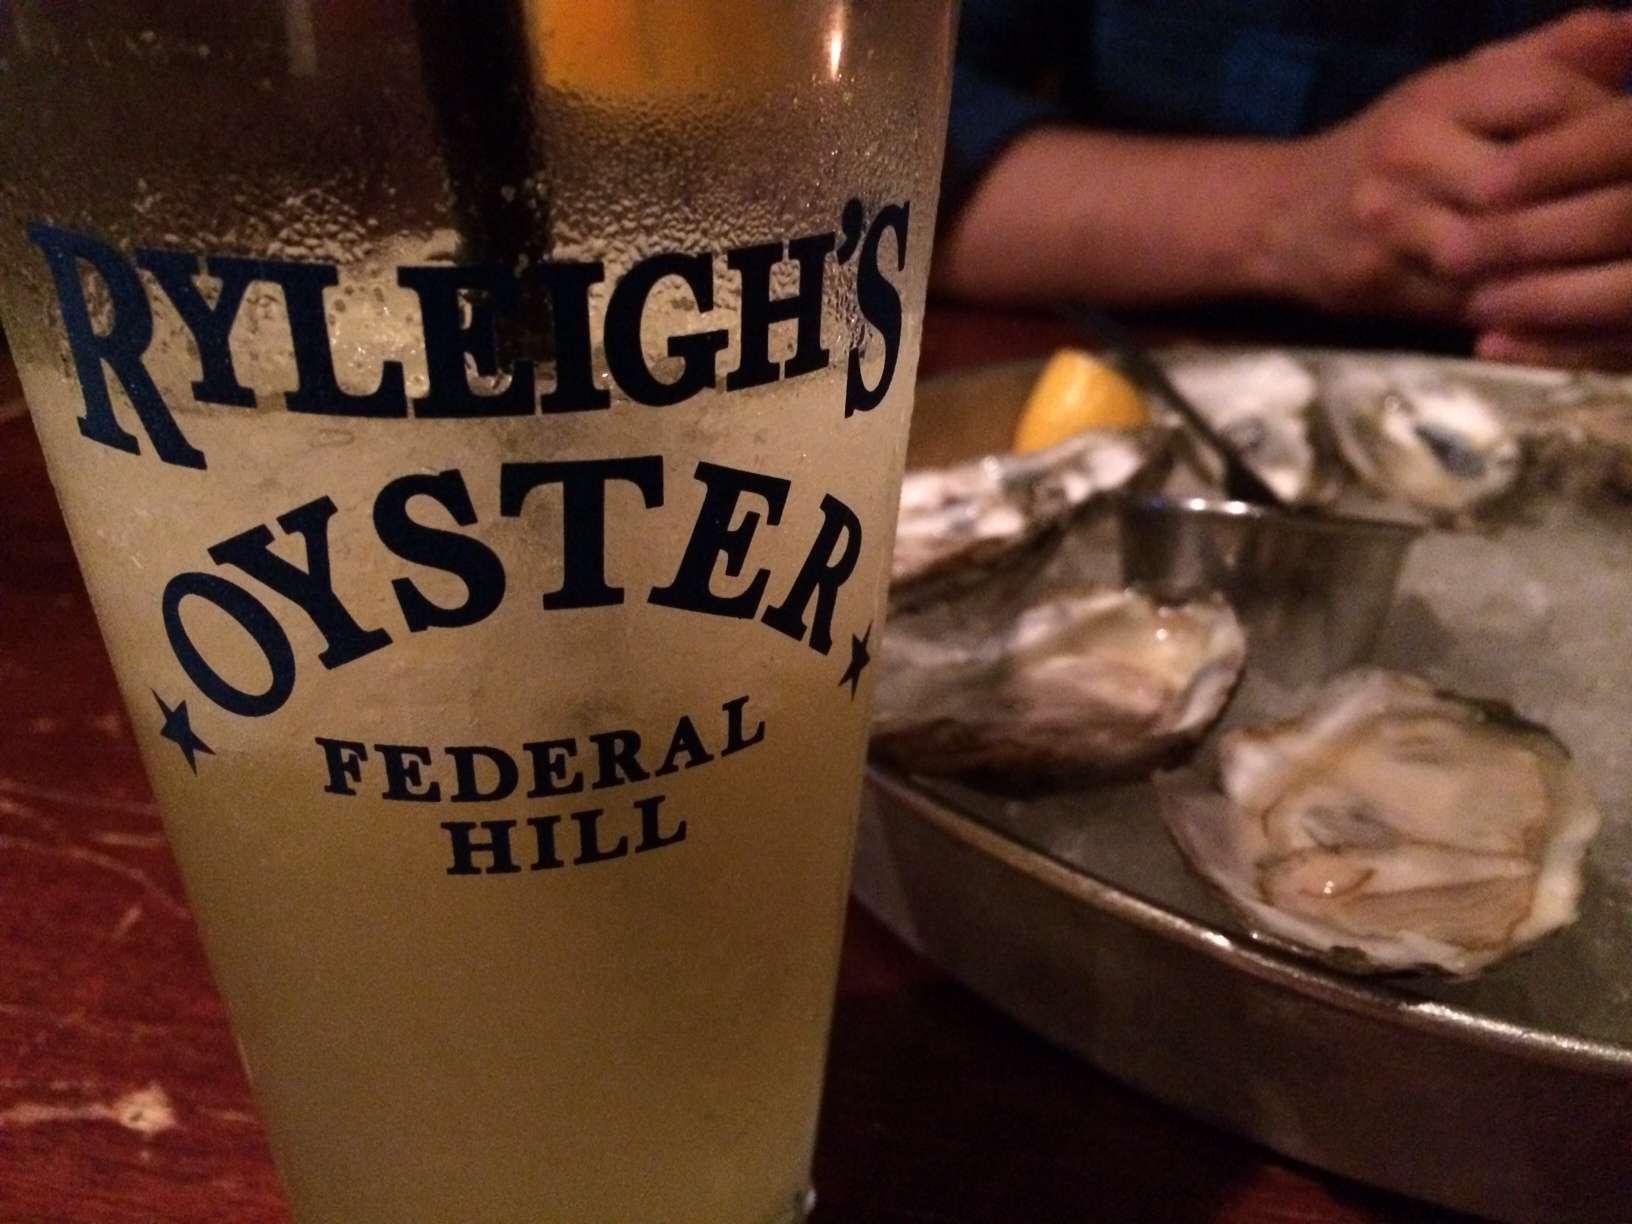 Ryleigh's Oyster bar